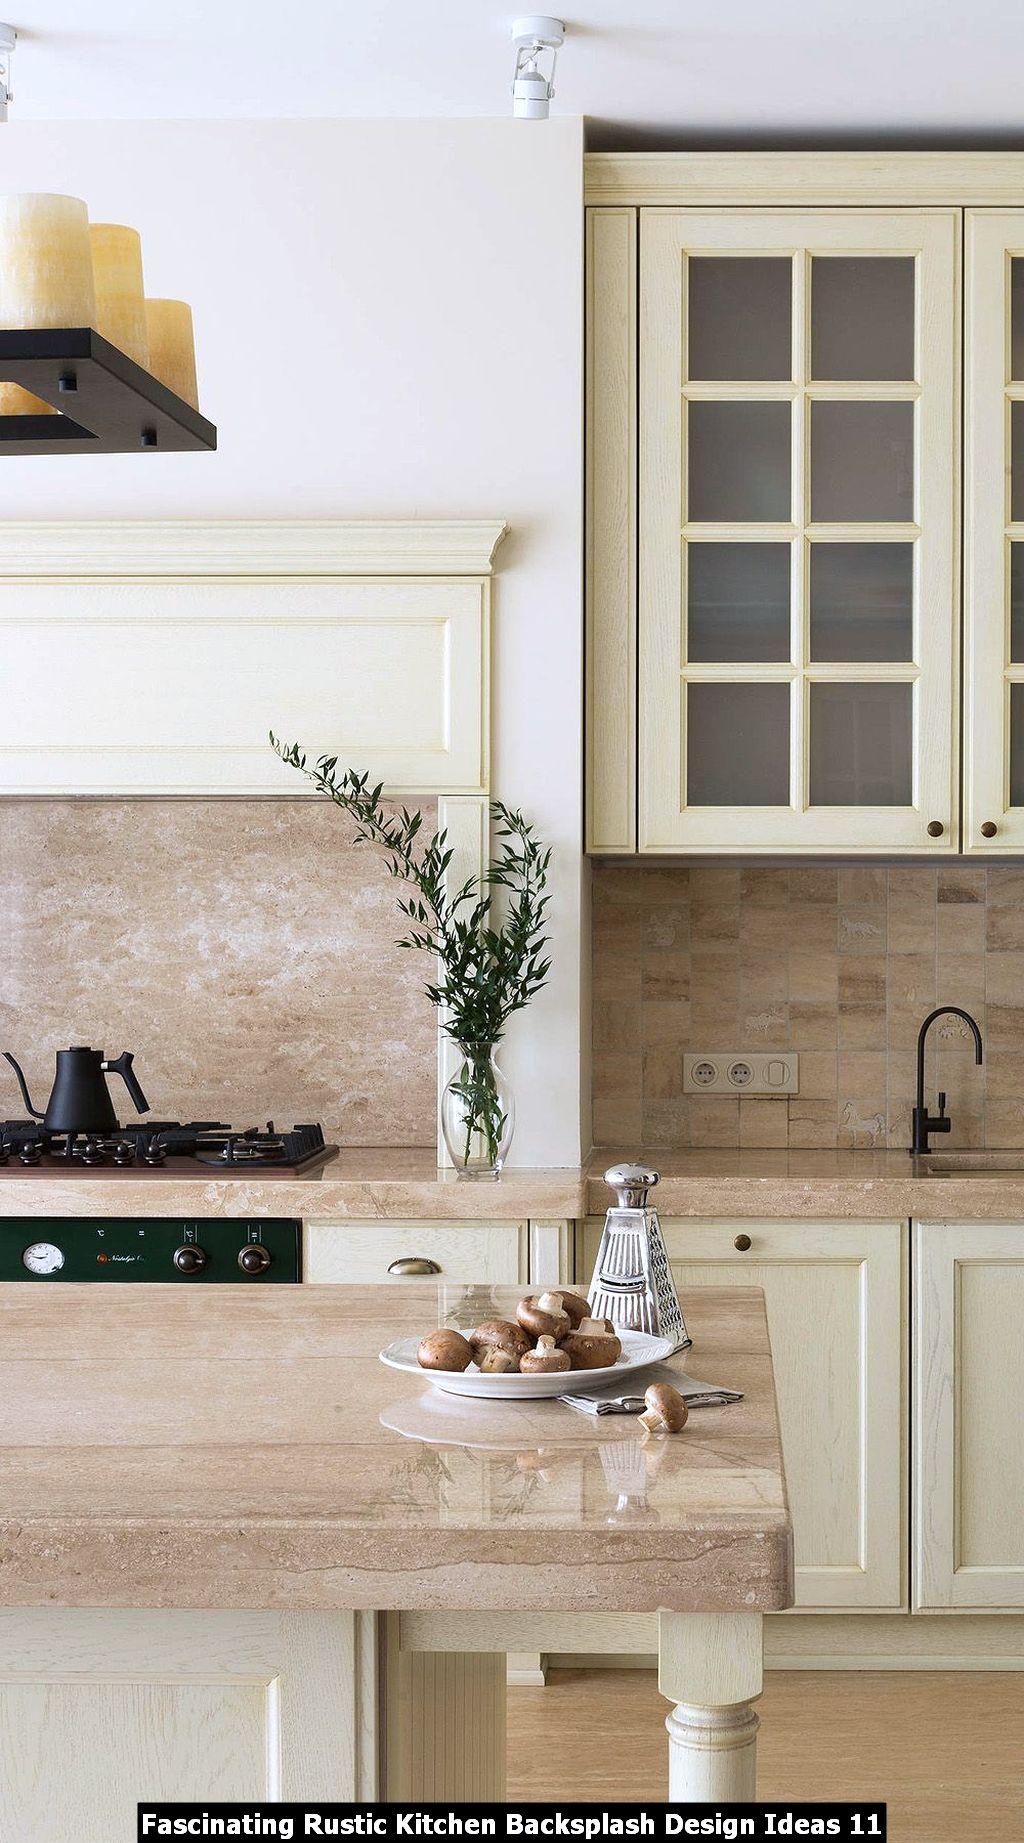 Fascinating Rustic Kitchen Backsplash Design Ideas 11